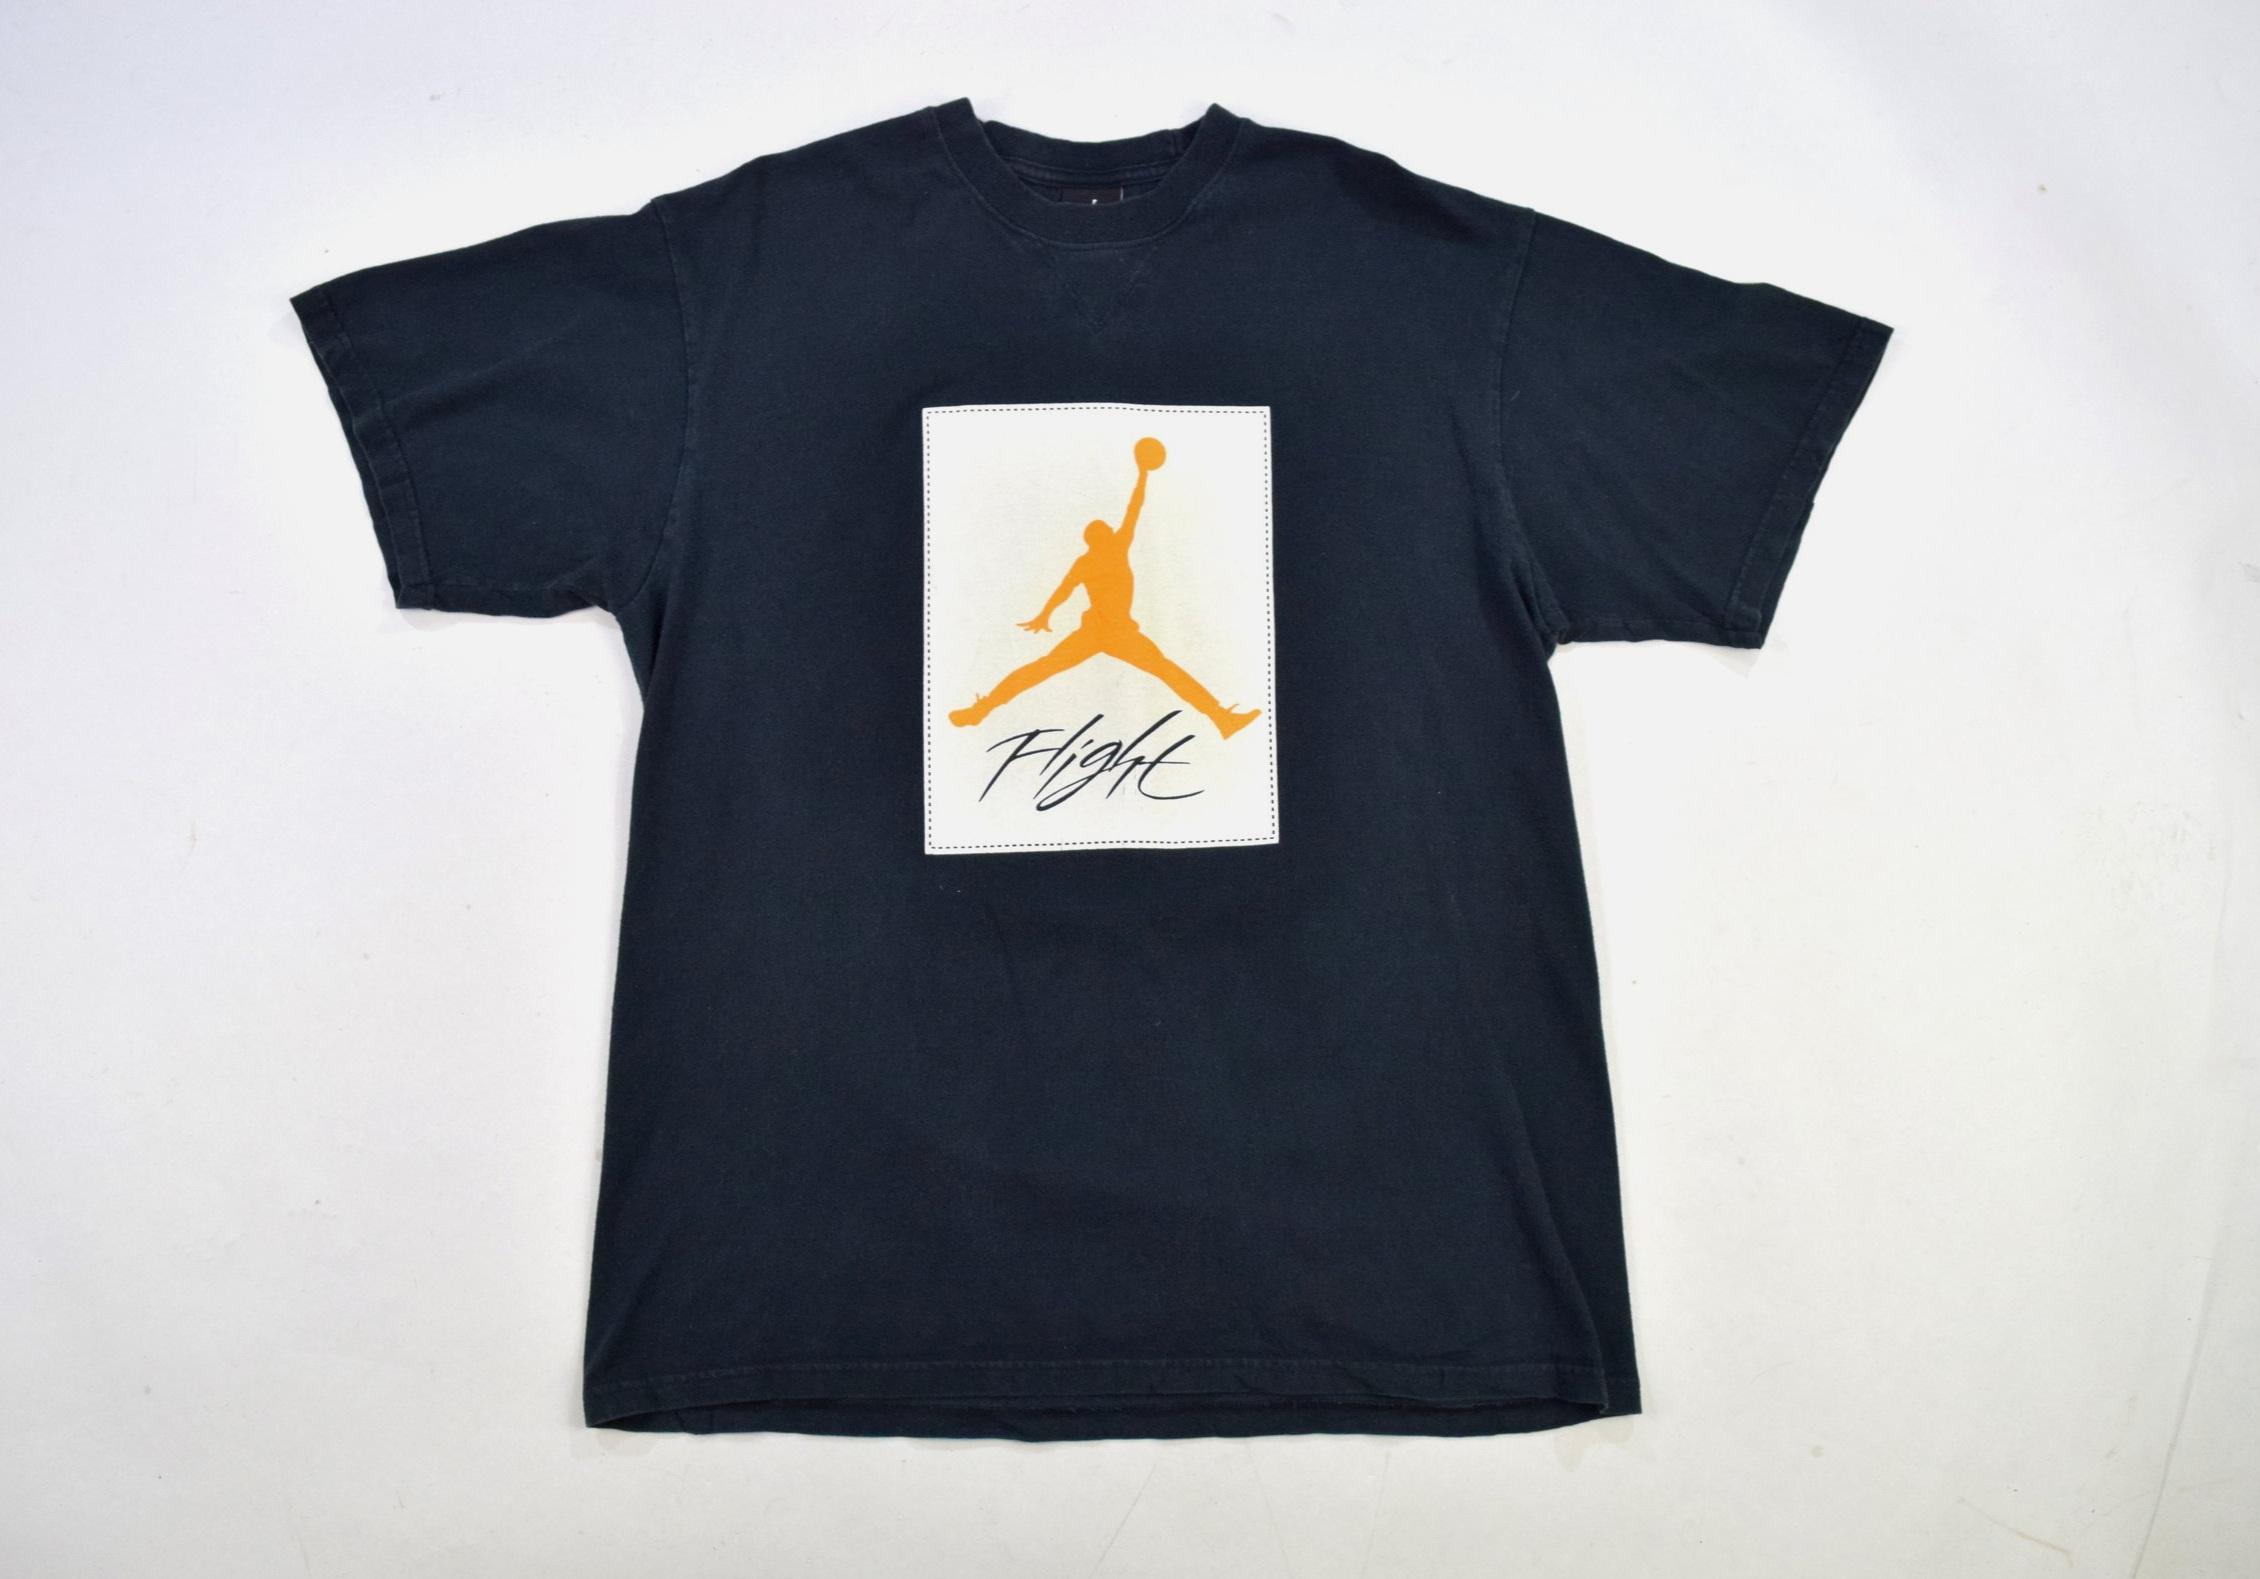 85115c85dd29 Black Air Jordan  Flight  Crew Neck T Shirt — Headlock Vintage